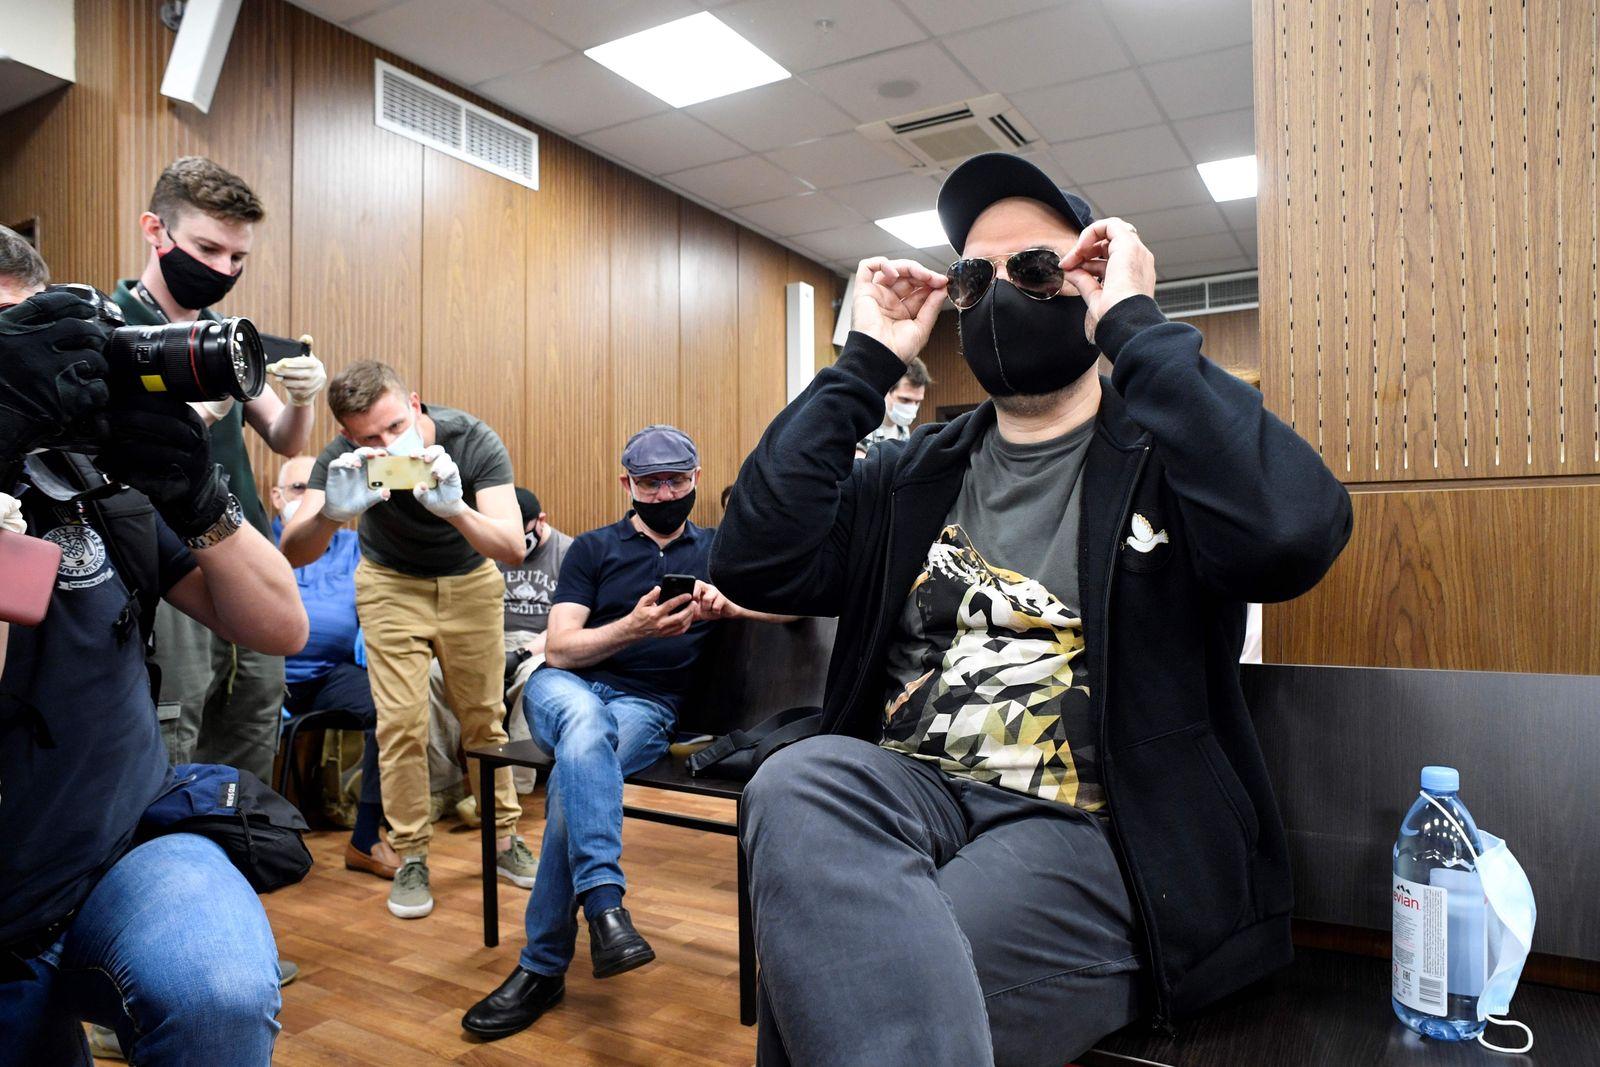 RUSSIA-COURT-THEATRE-FILM-POLITICS